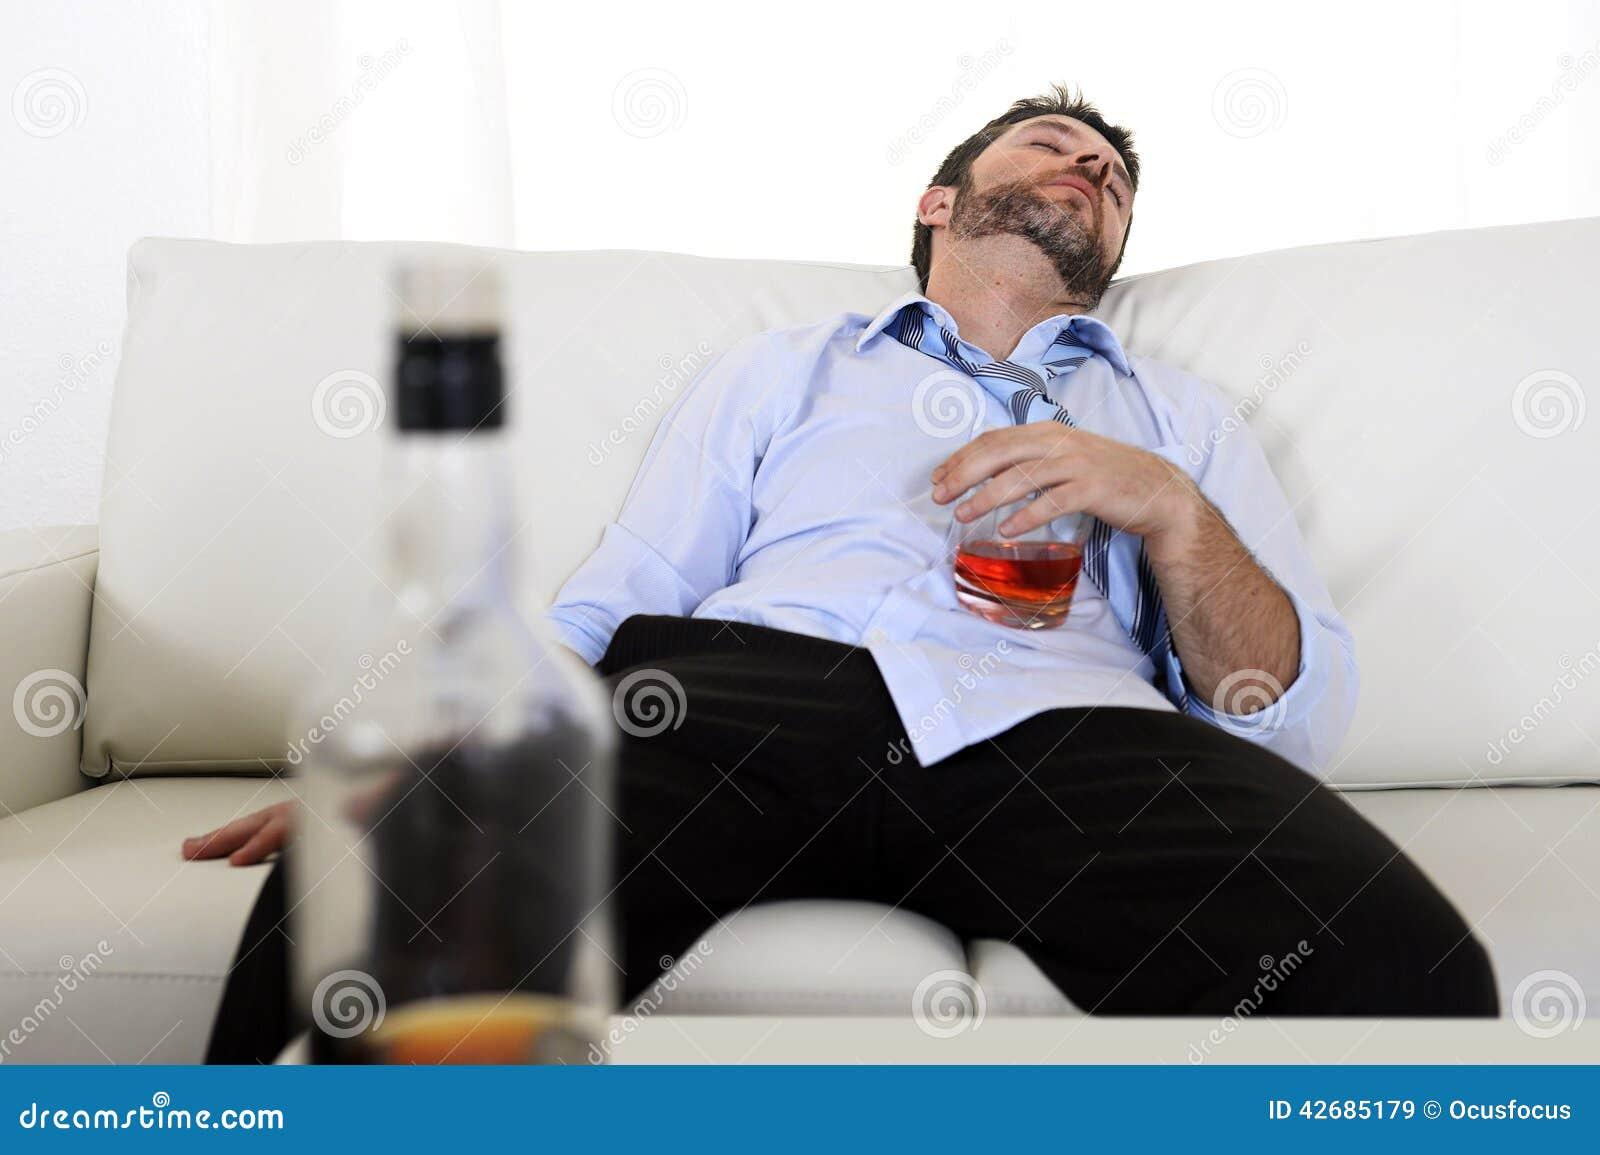 alcohol addiction and lying